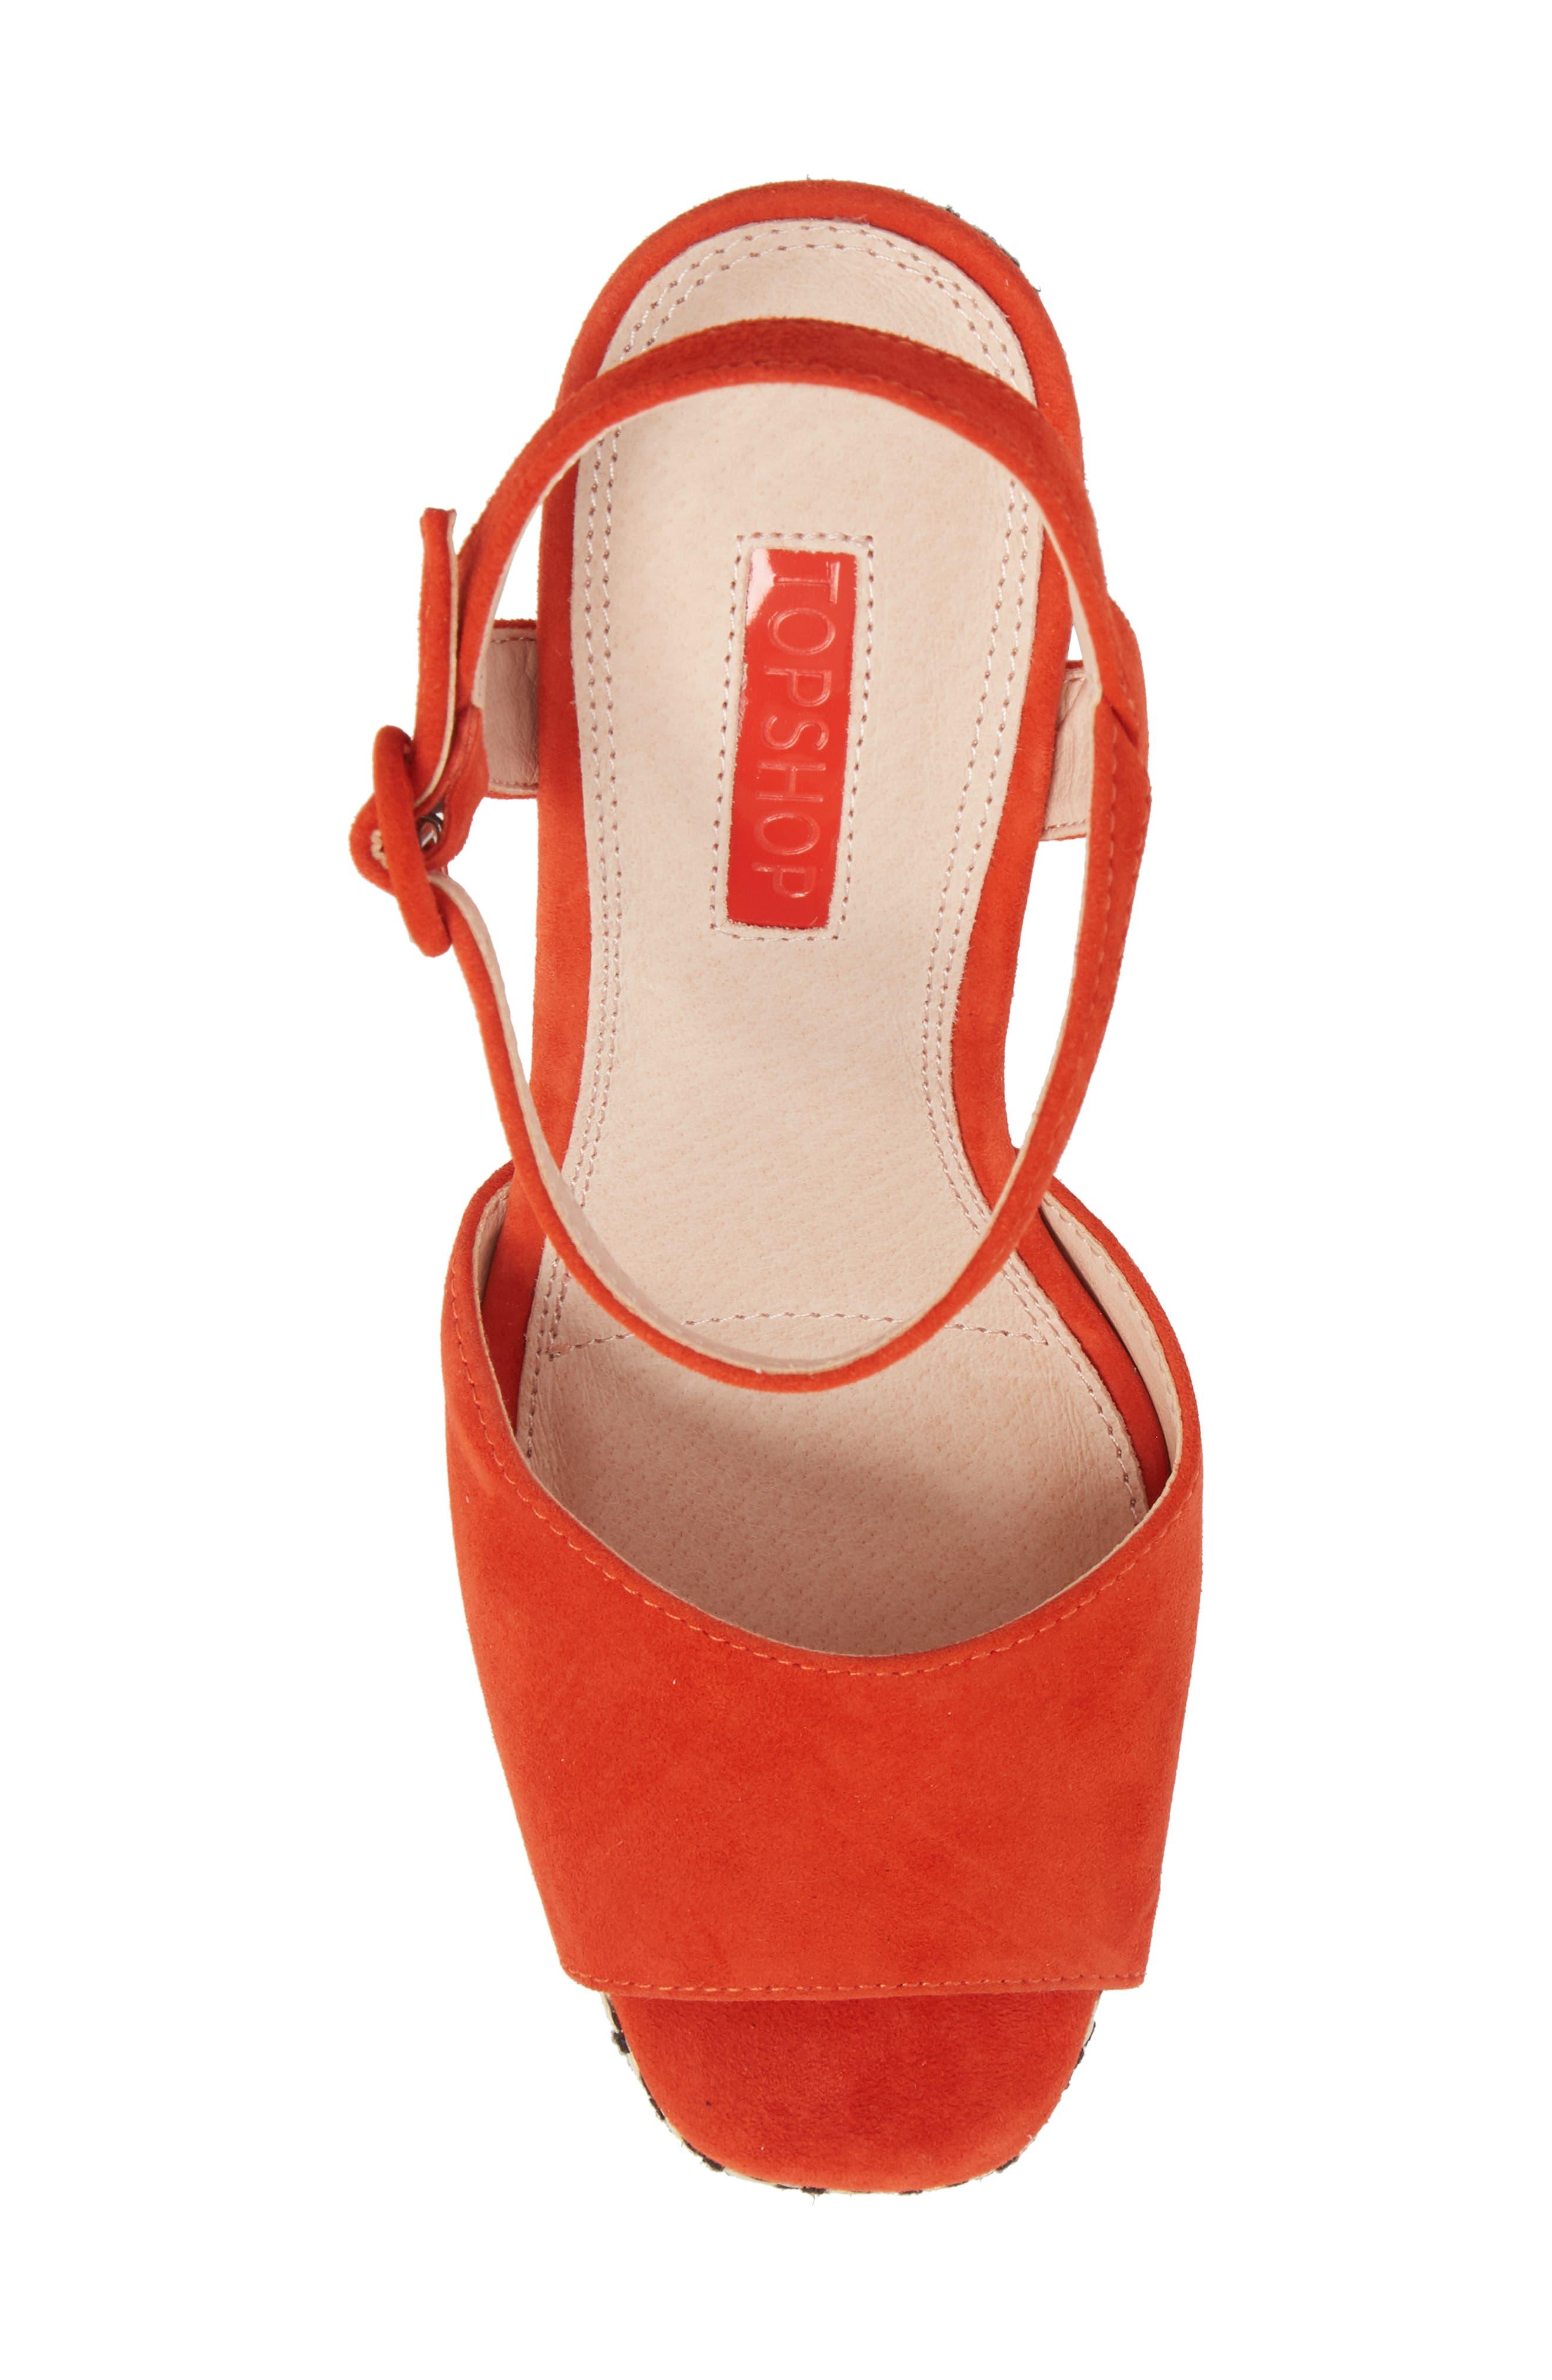 Laura Woven Block Heel Sandal,                             Alternate thumbnail 10, color,